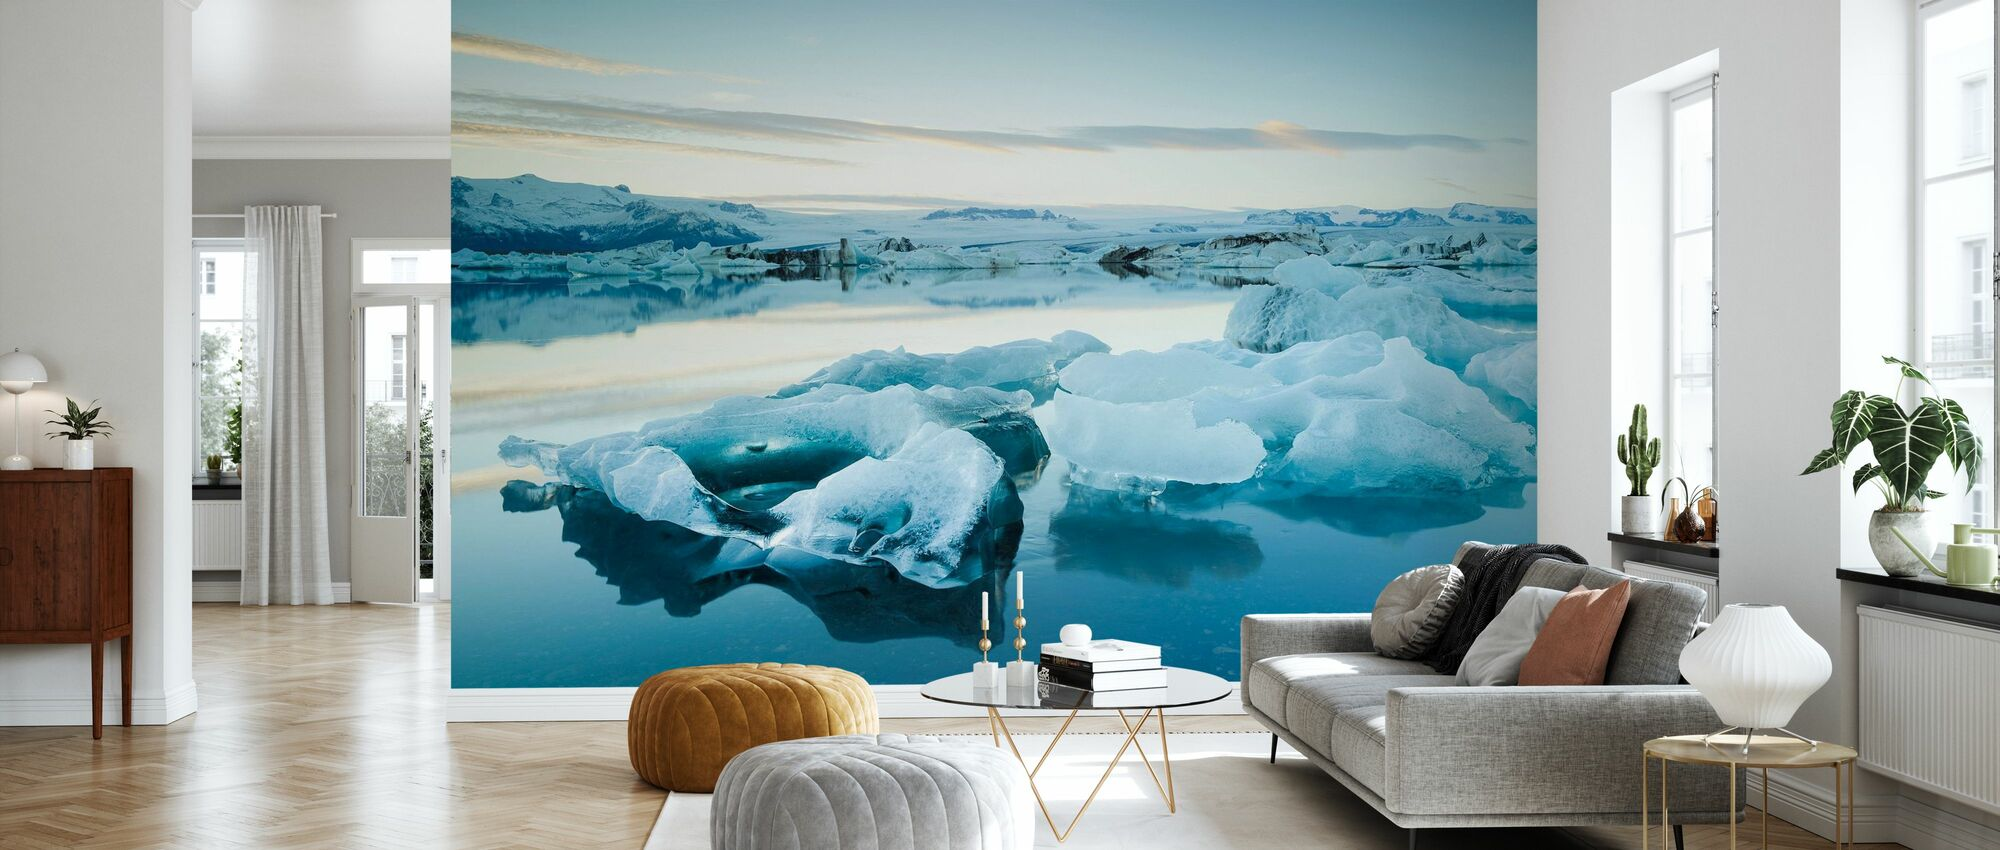 Sculptural Ice - Wallpaper - Living Room